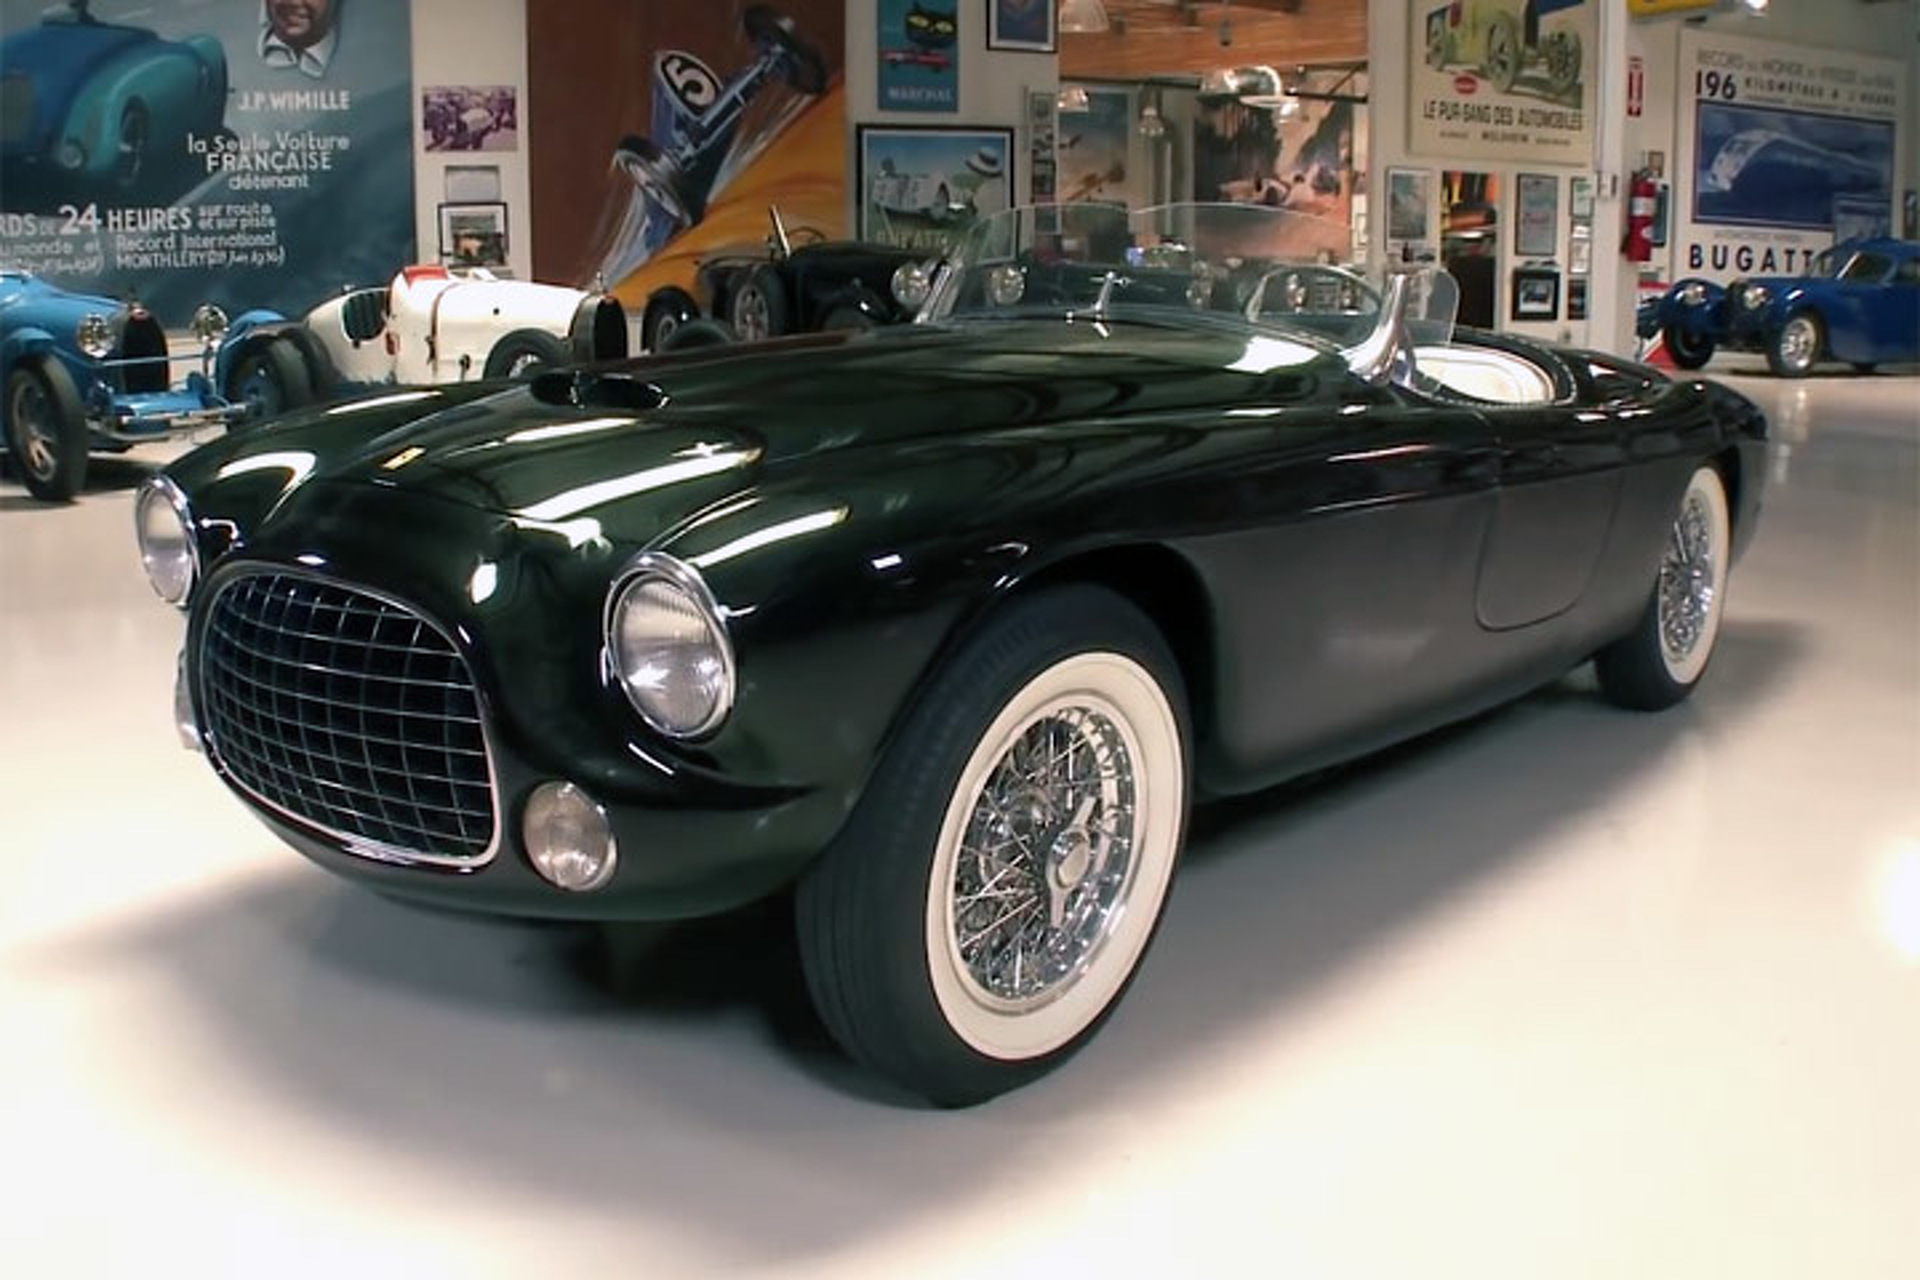 1952 Ferrari Barchetta Stops By Jay Leno's Garage product 2014-06-20 15:00:56